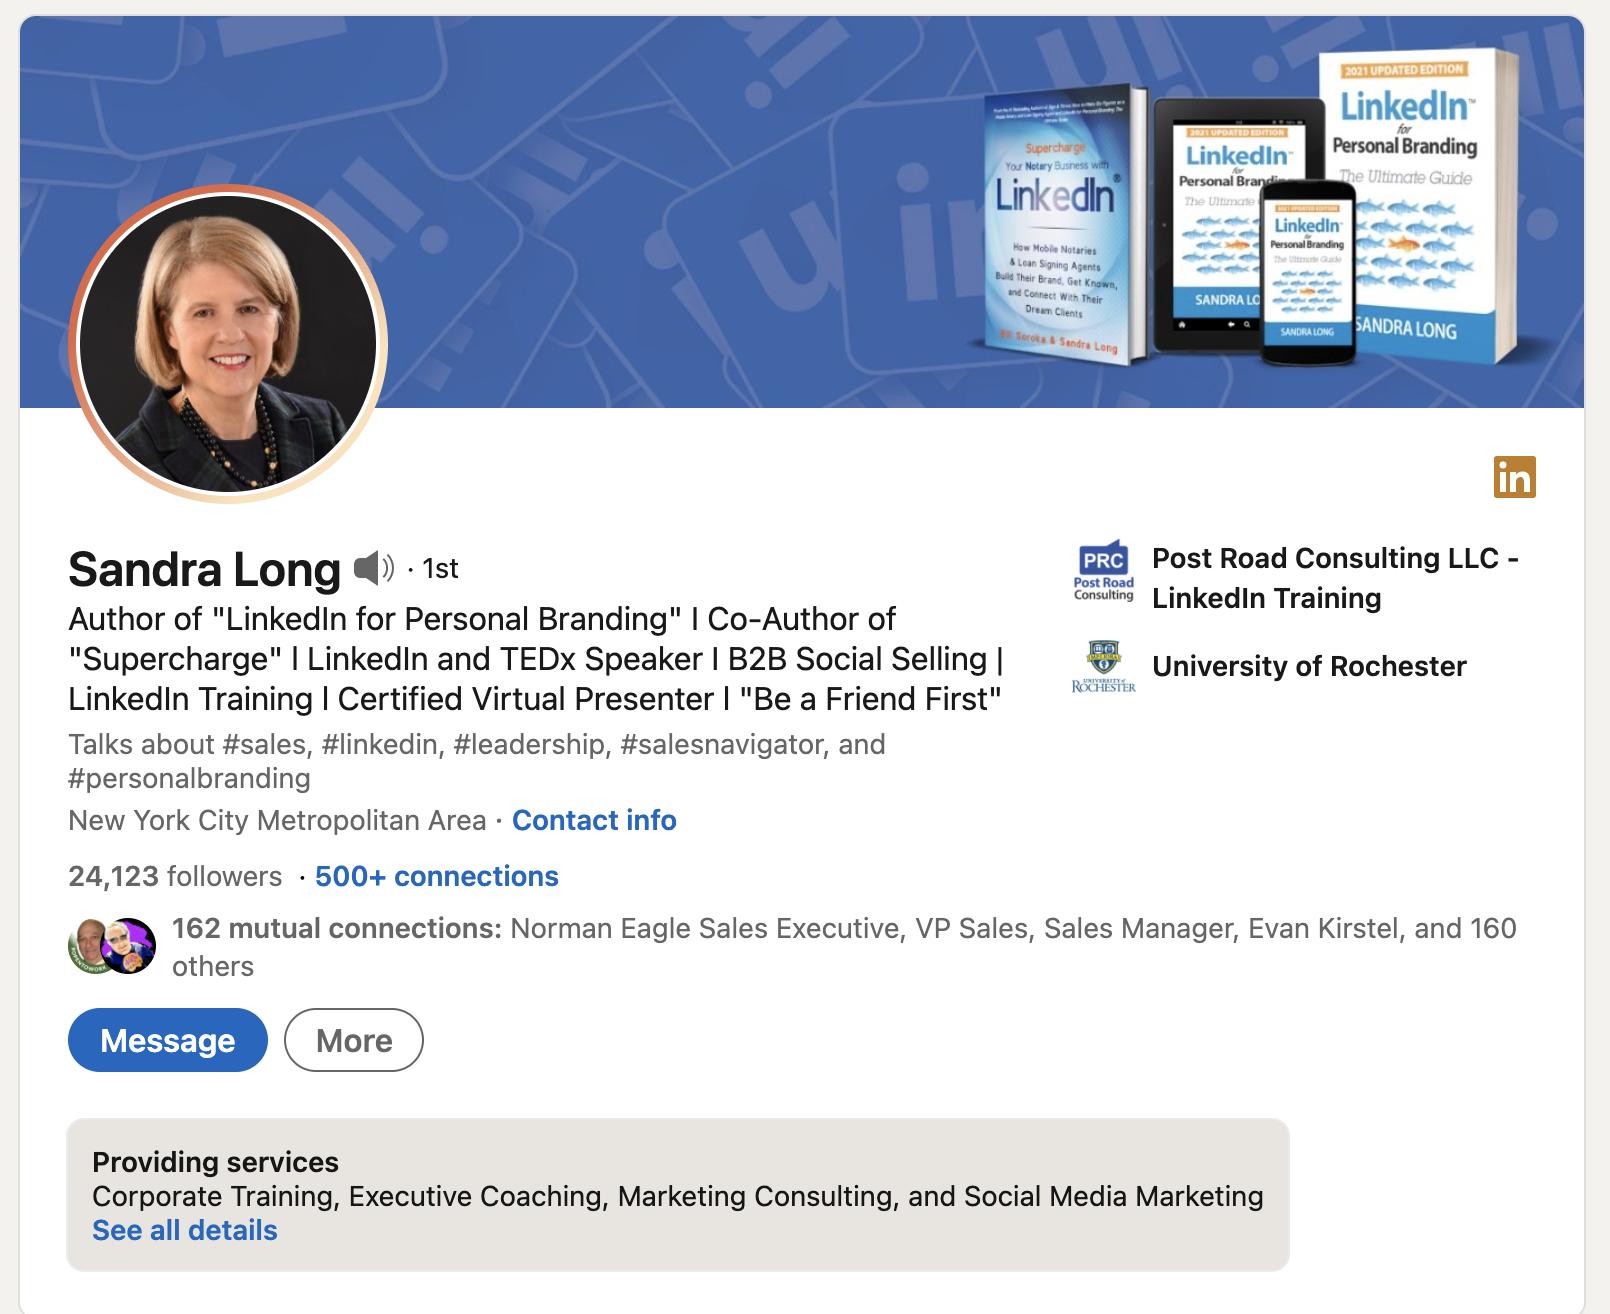 Sandra Long LinkedIn profile